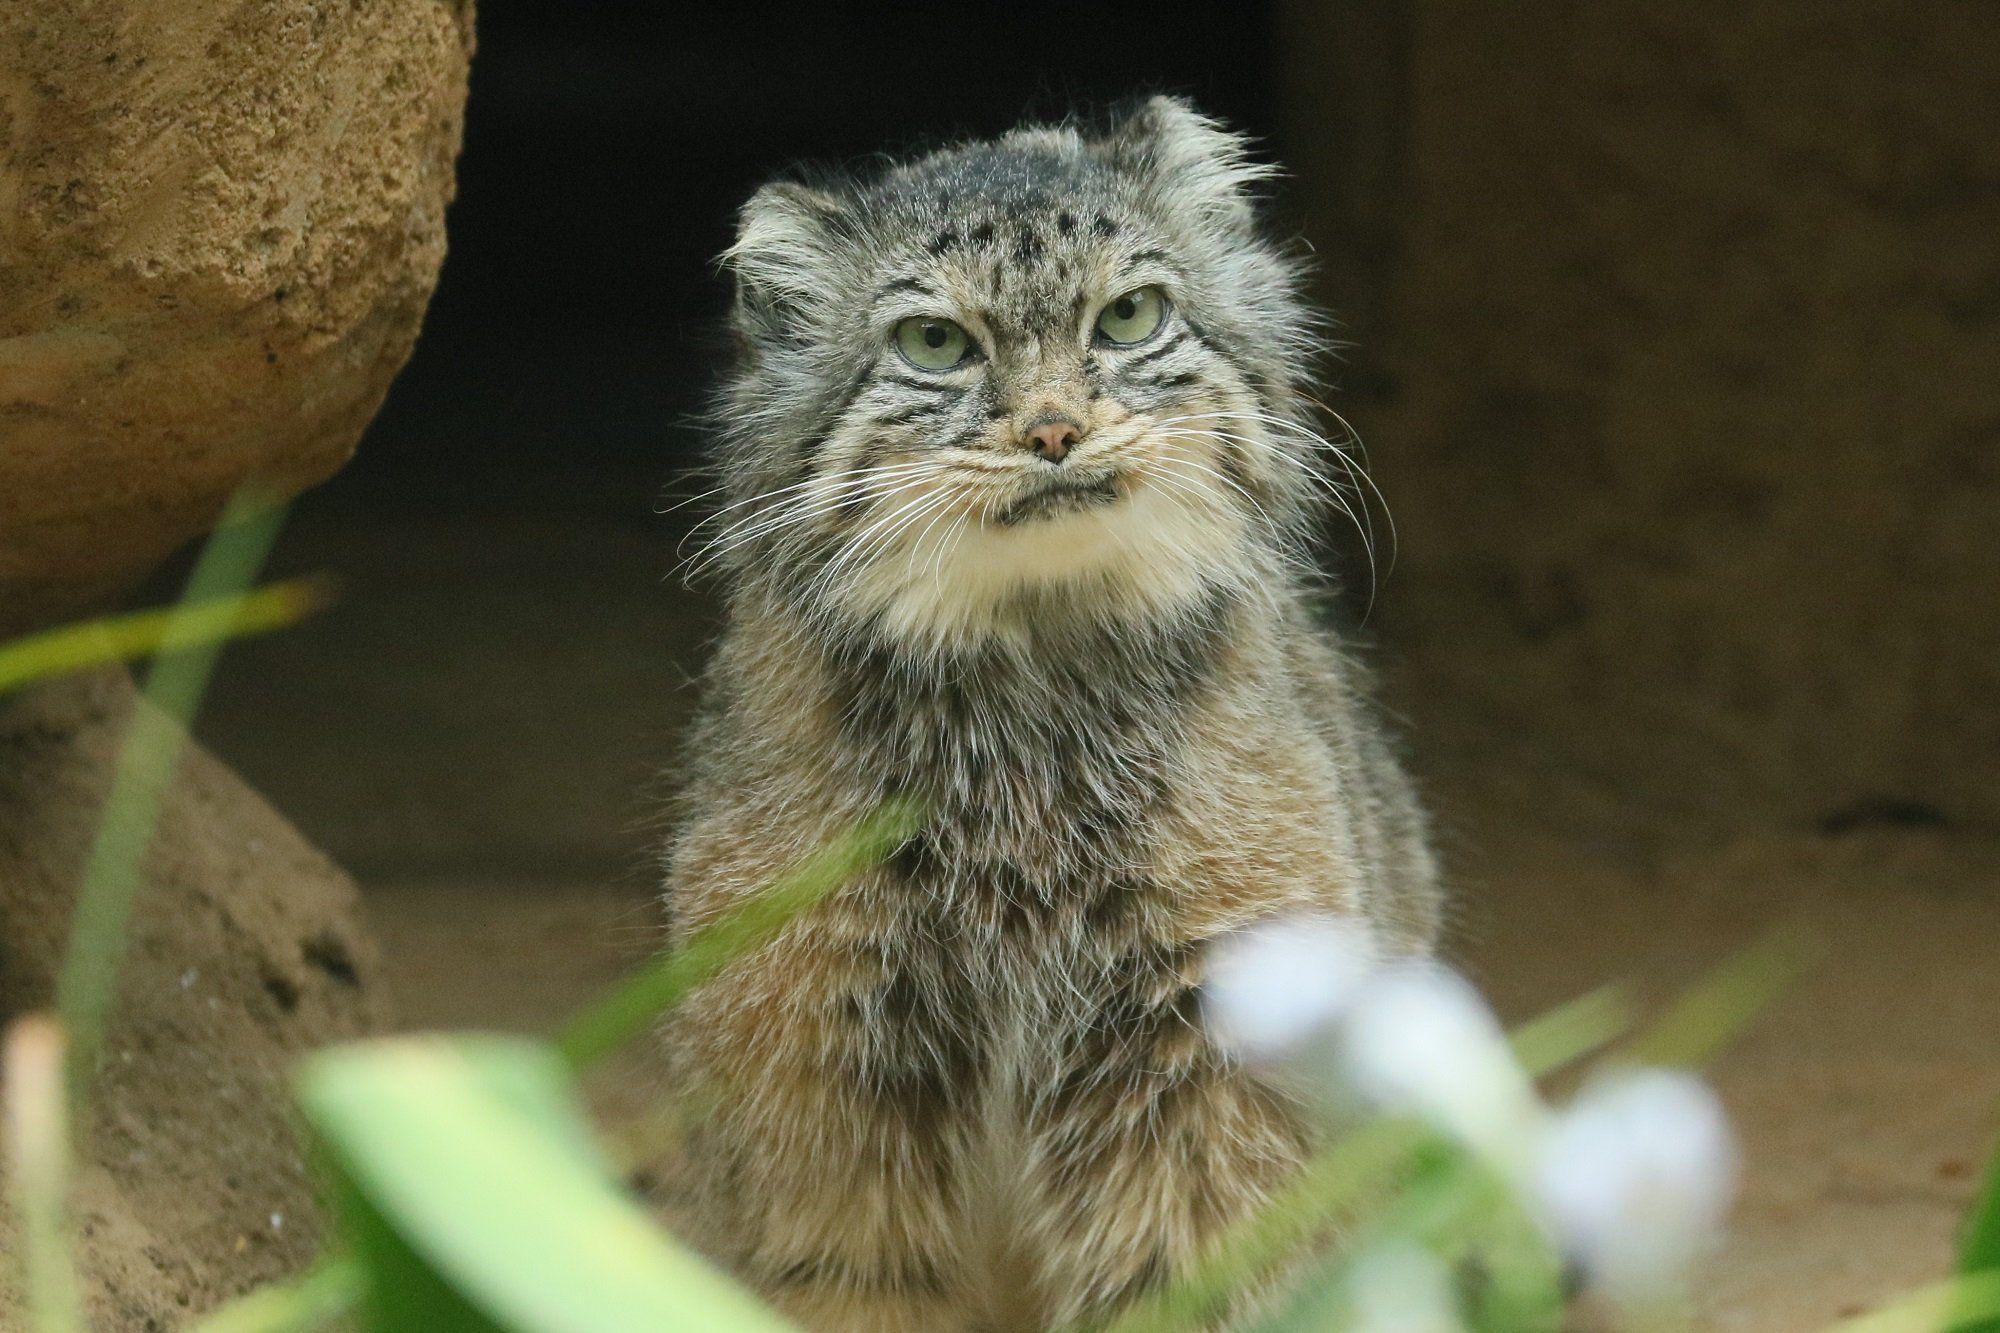 Pallas's Cat Small wild cats, Pallas's cat, Wild cats